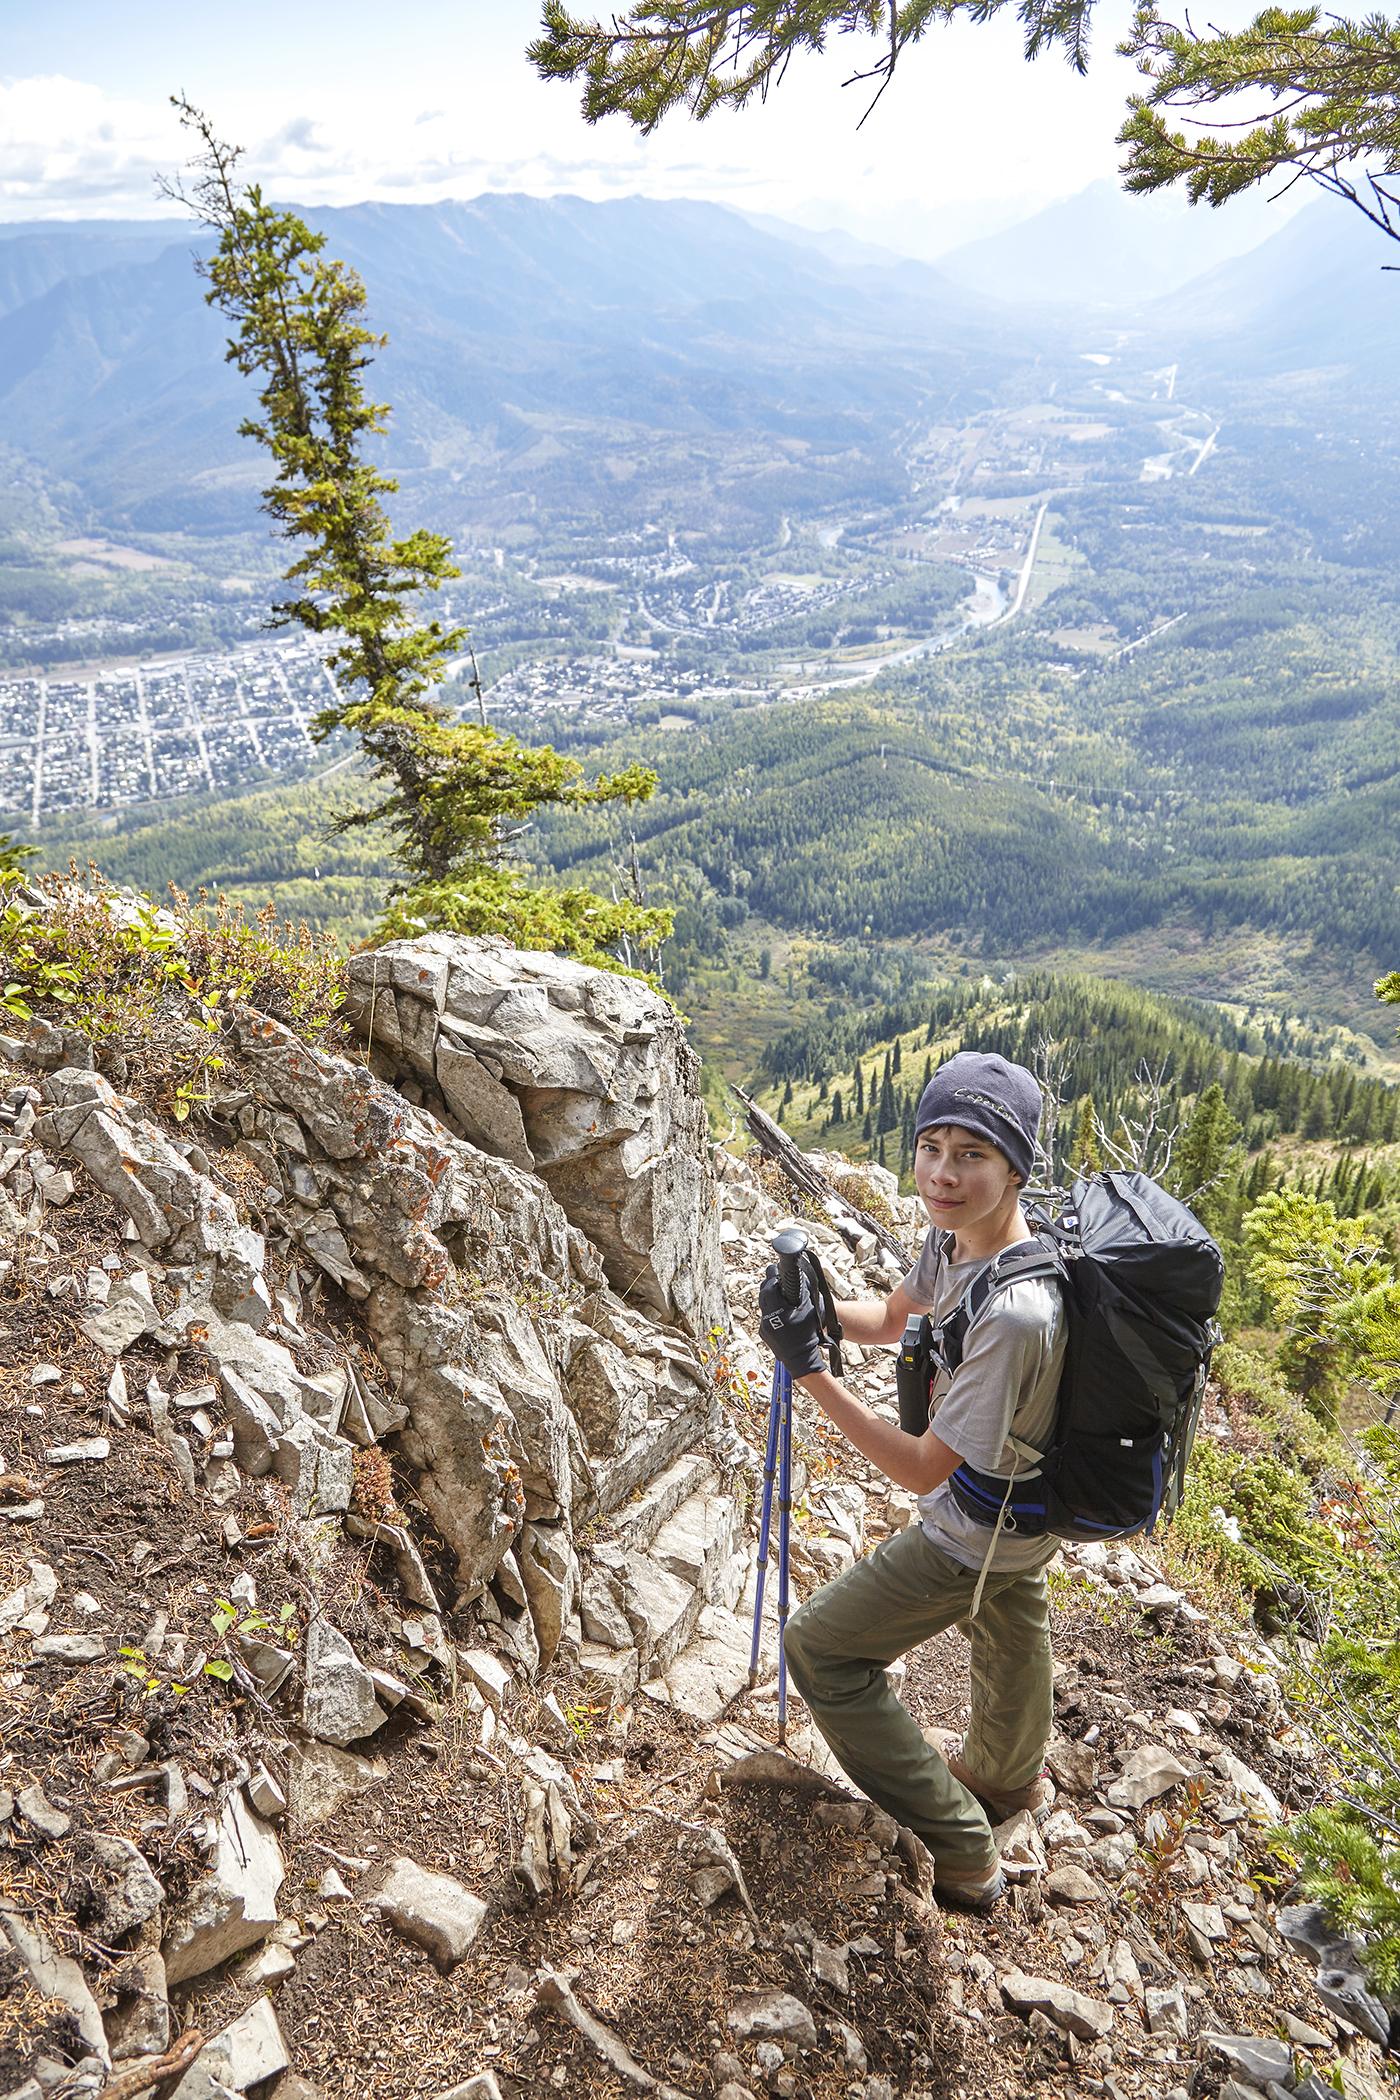 Yuri descends a rocky outcrop. Far below is the Fernie townsite.